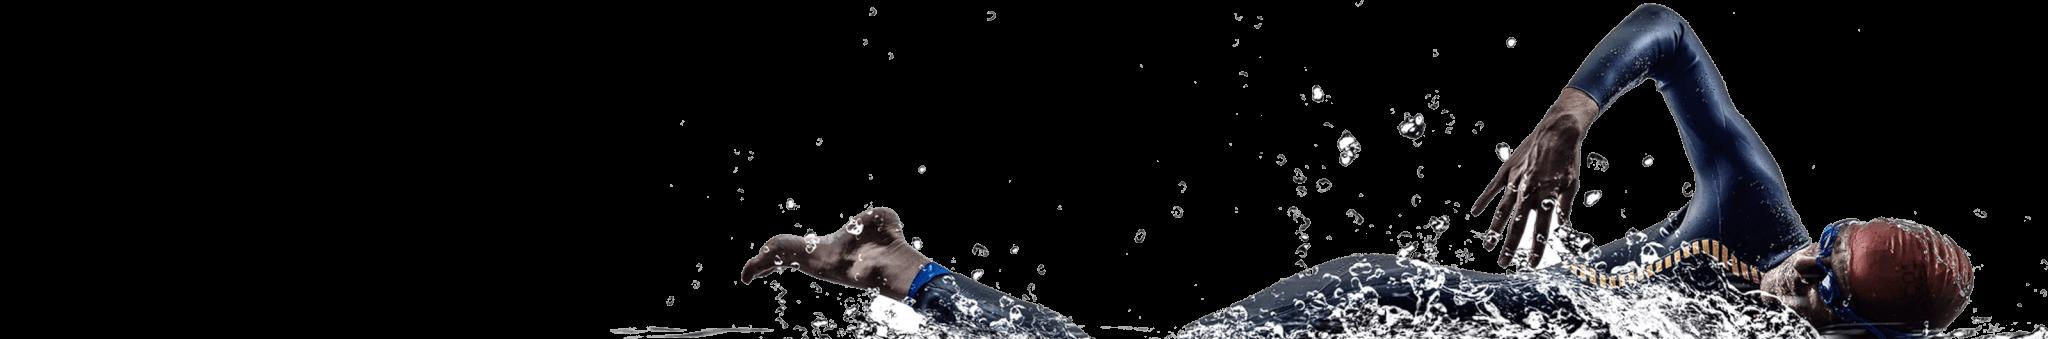 https://www.igkdf-vanves.fr/wp-content/uploads/2017/10/inner_swimmer.png